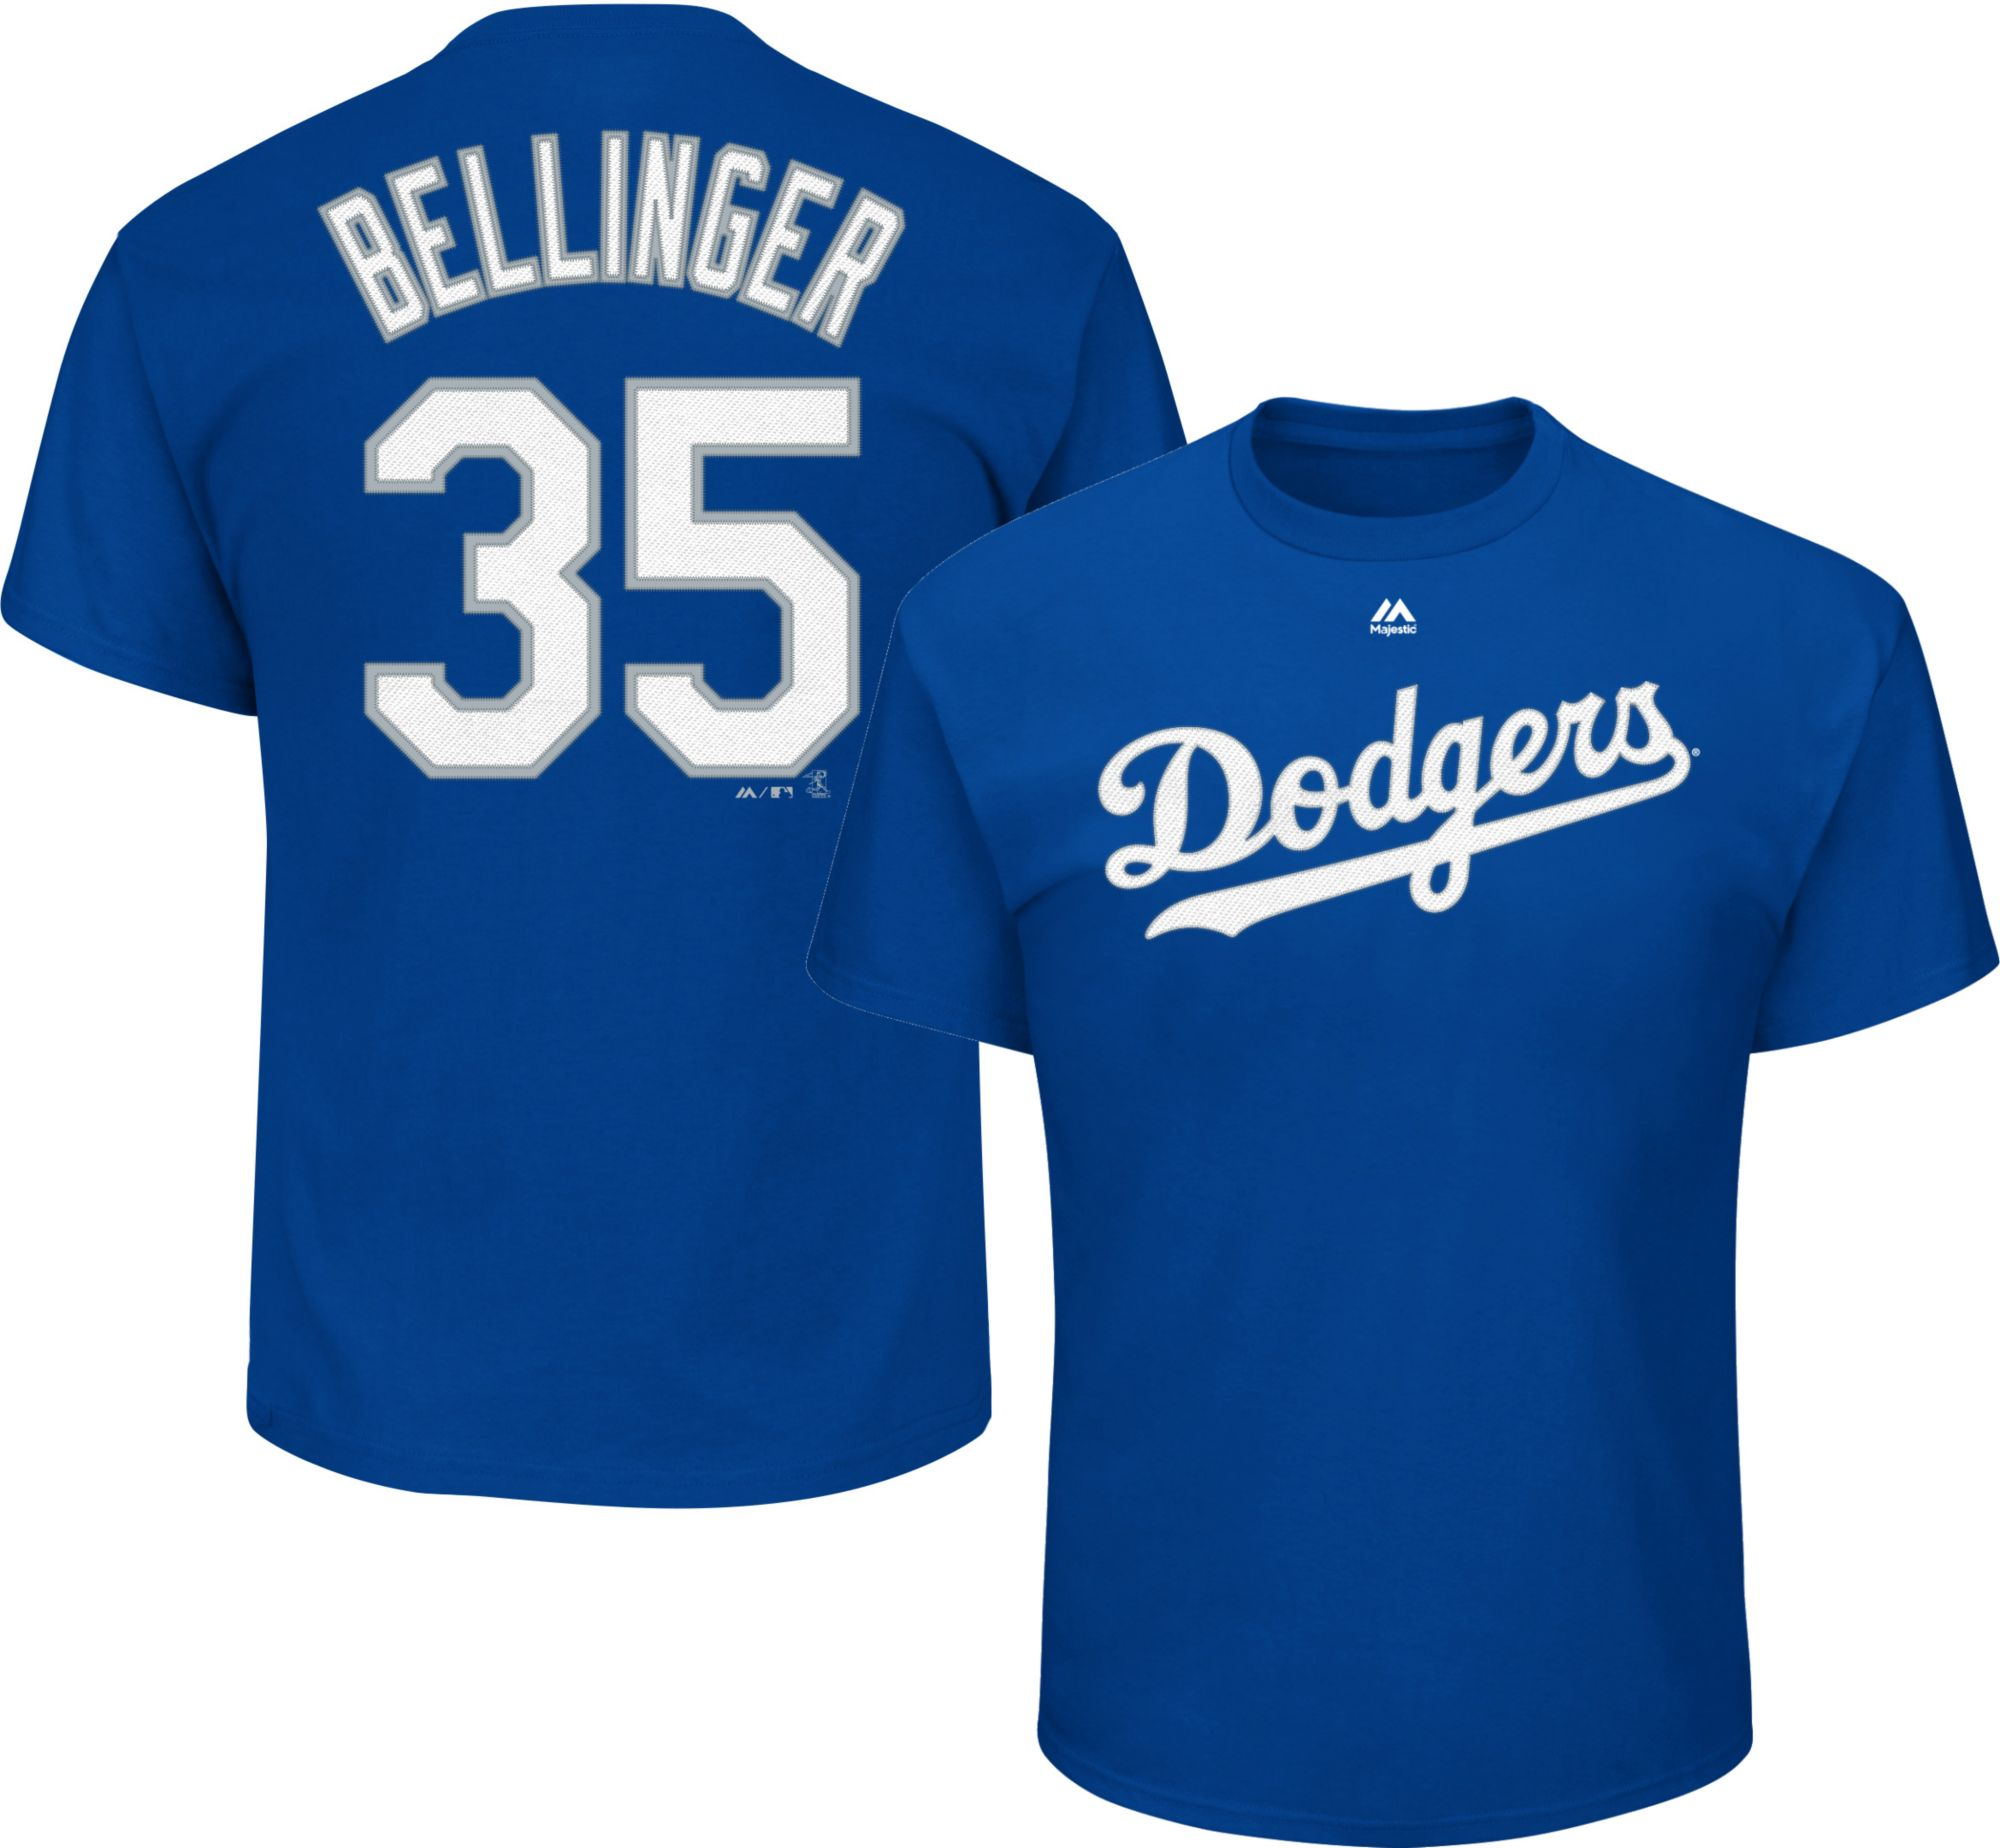 Womens Dodgers Shirts Near Me bccb9a7e531